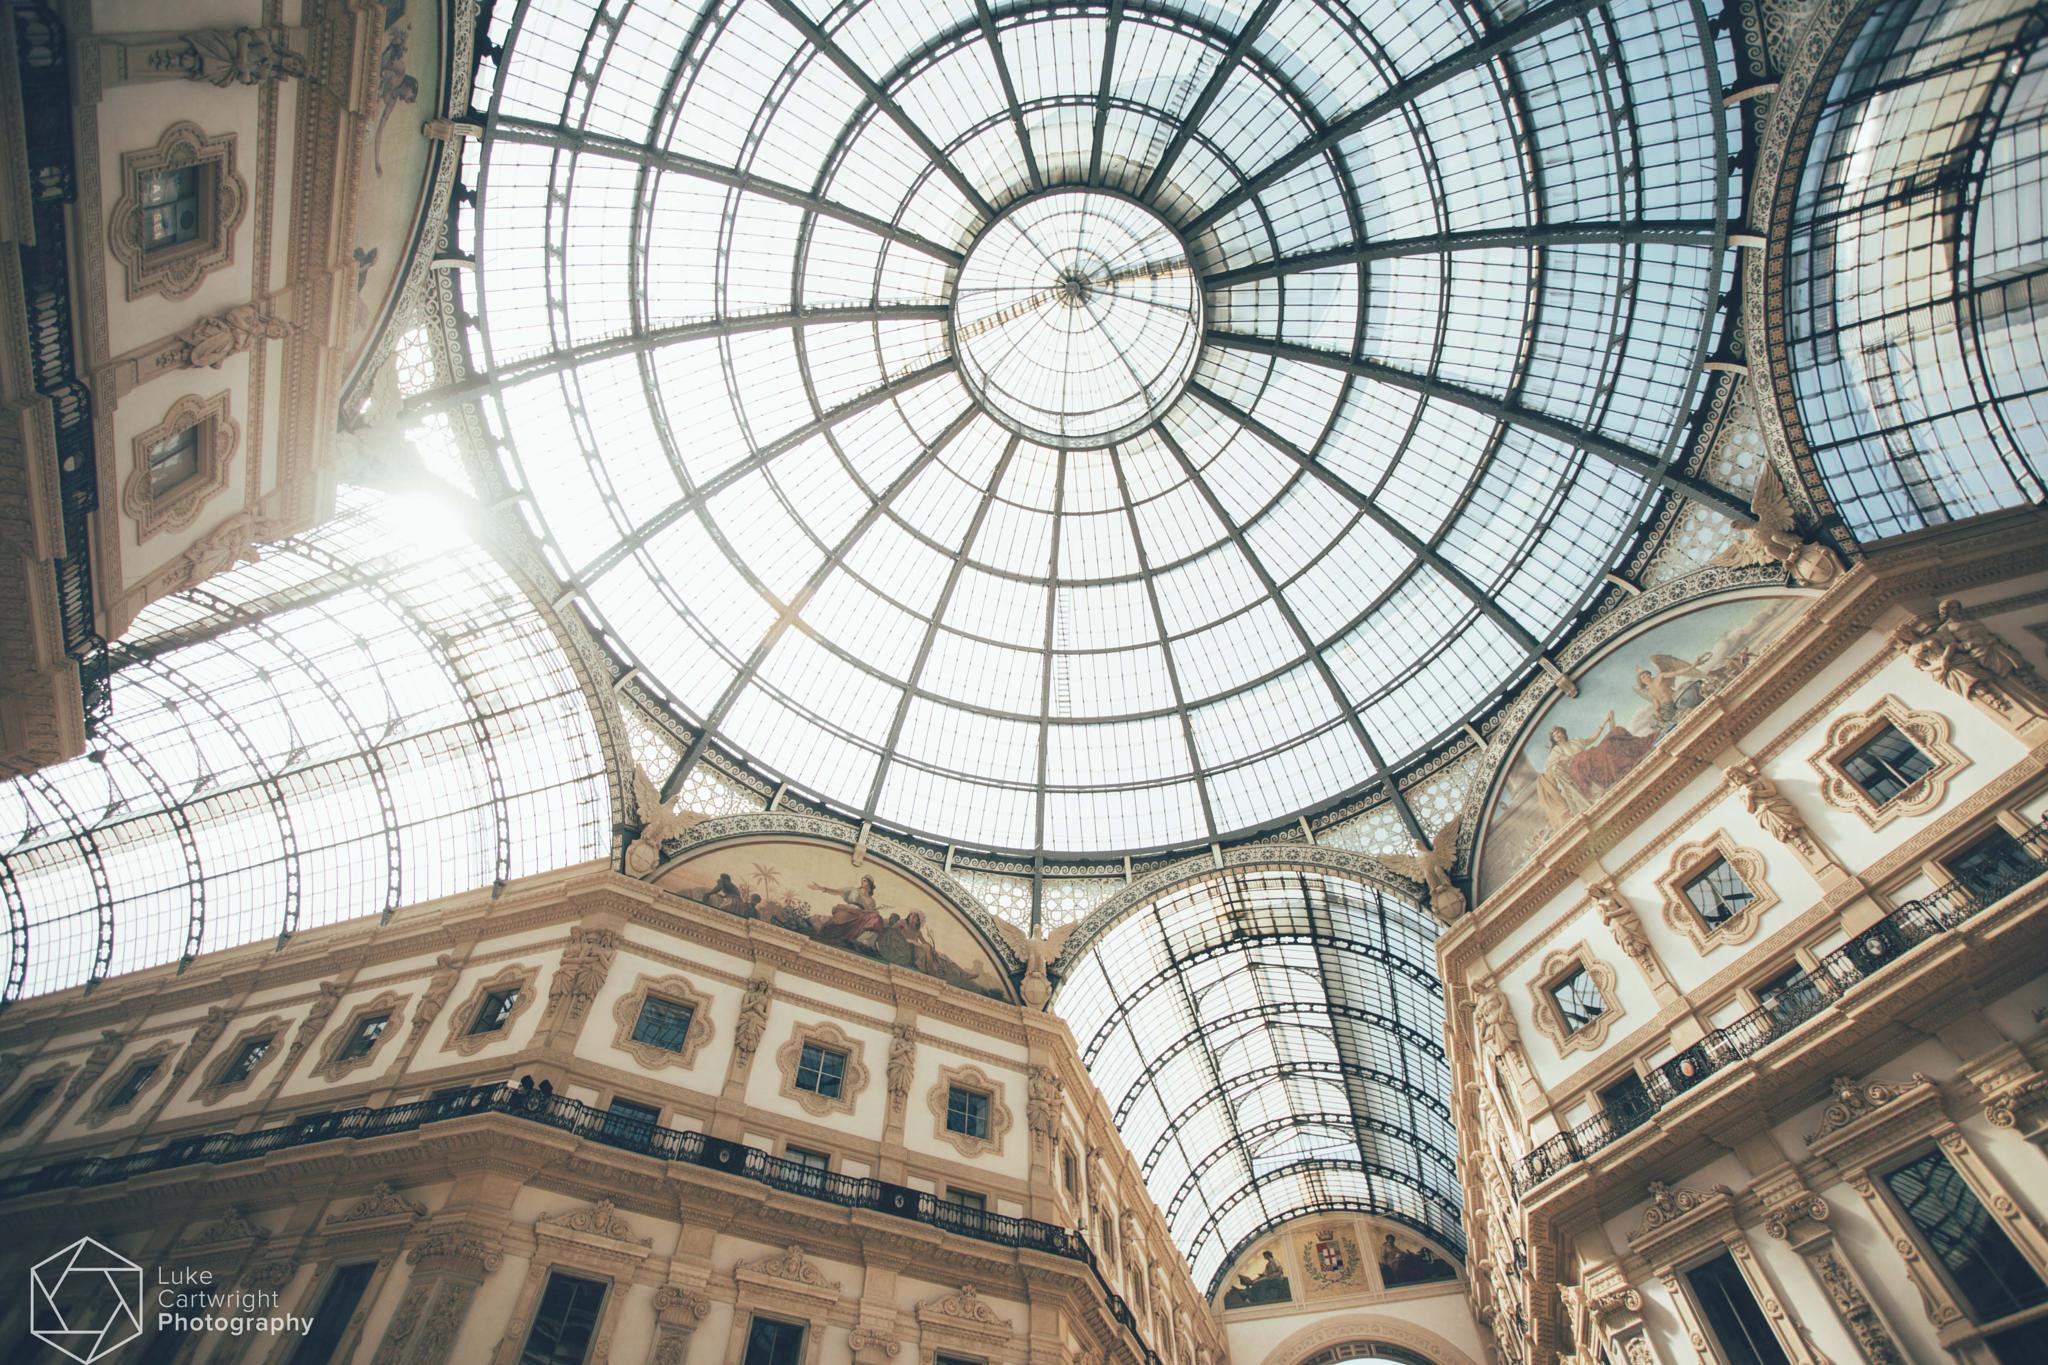 Galleria Vittorio Emanuele II|5DMKIII by Luke Cartwright